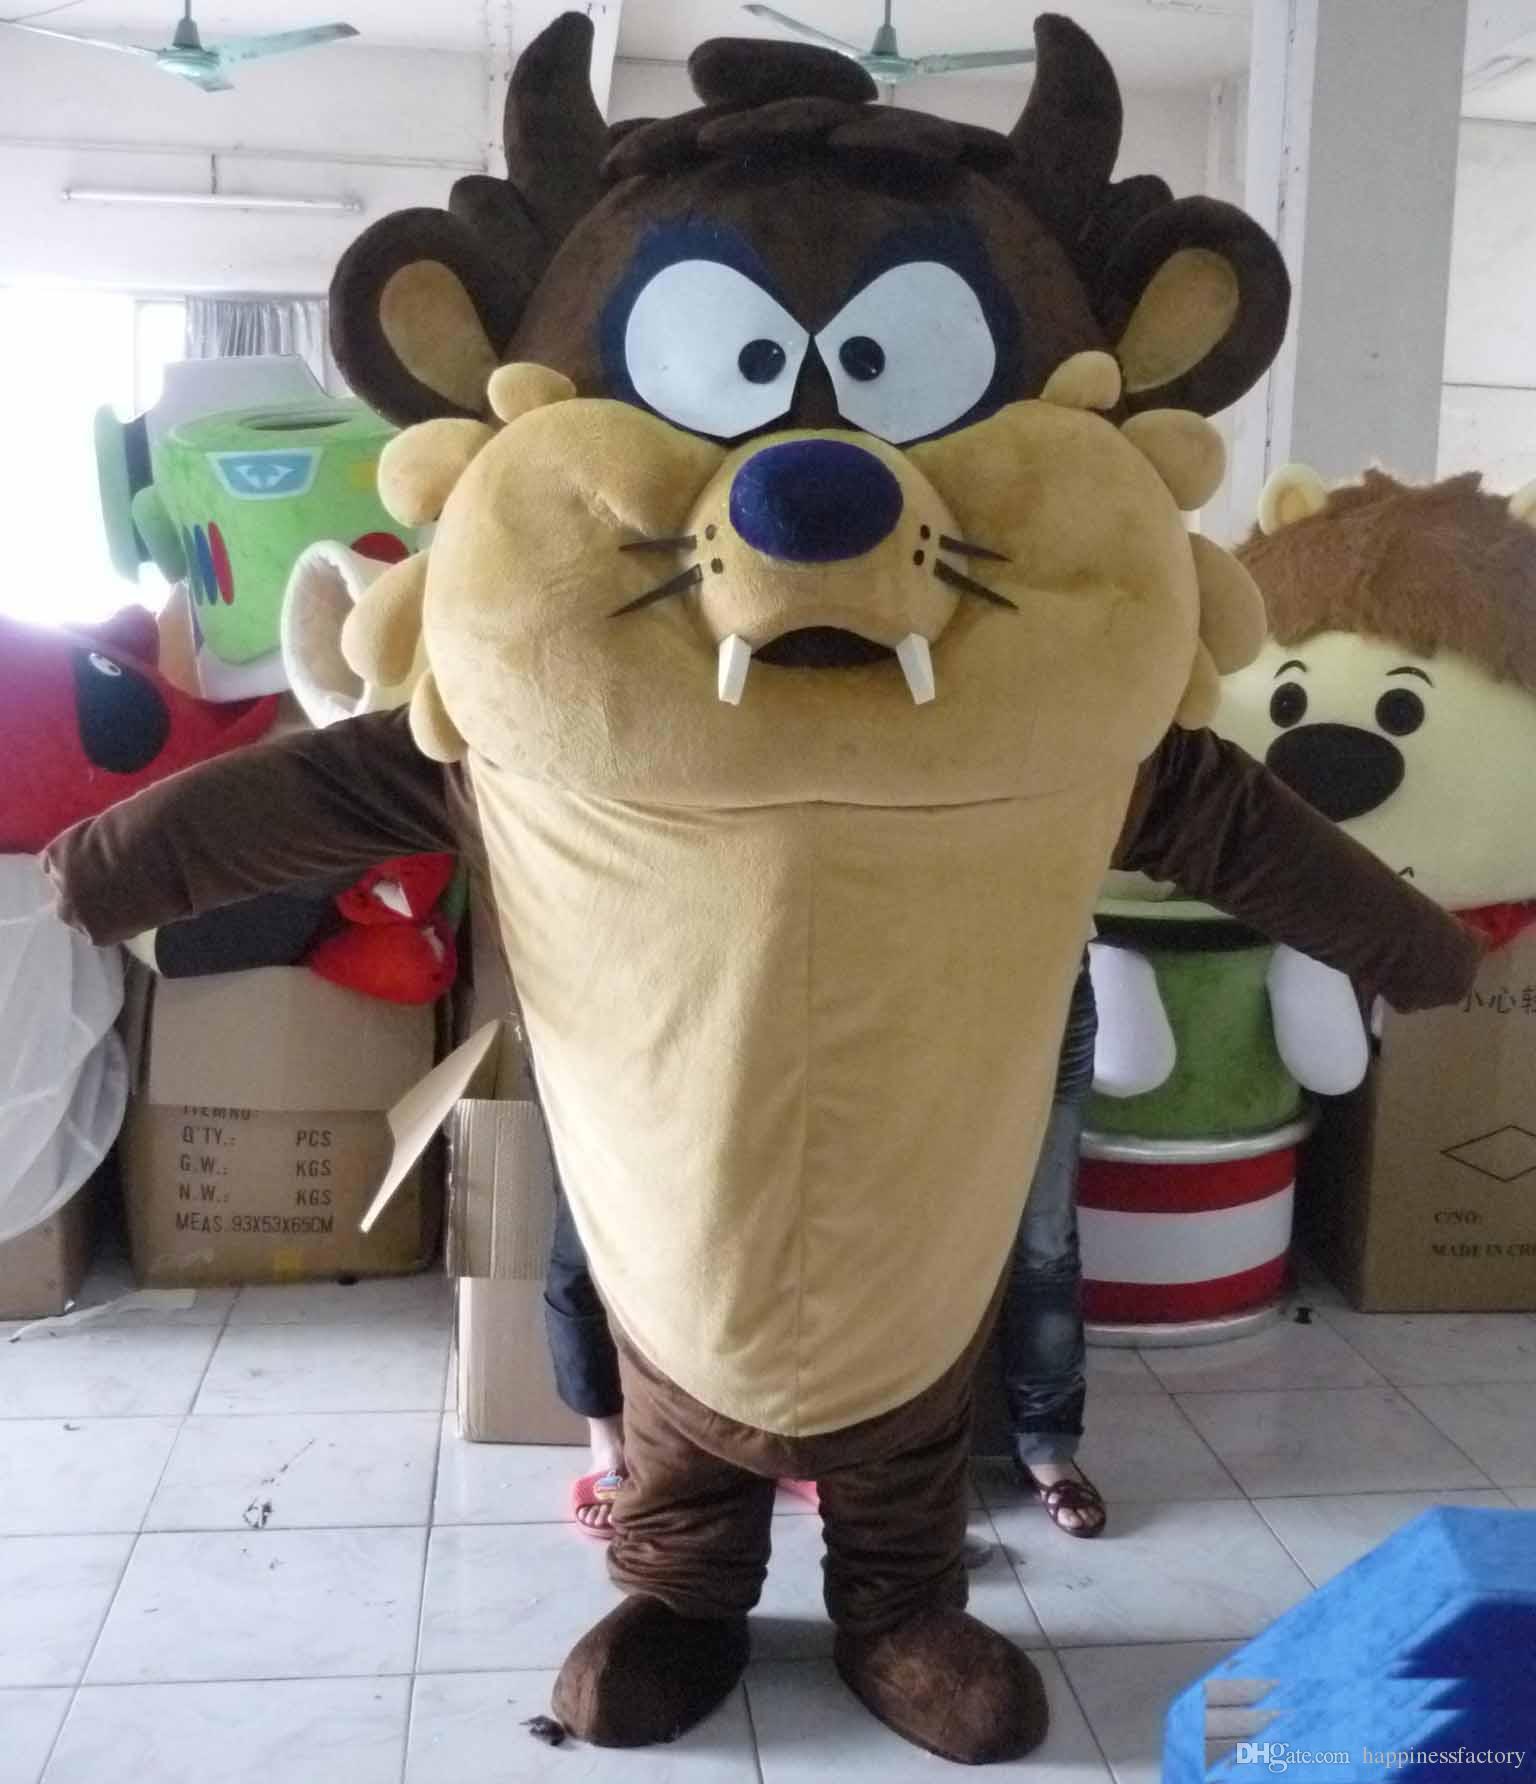 Продажа фабрики скидки 2019 головной костюм талисмана Tasmanian Devil для взрослого, котор нужно носить для продажи